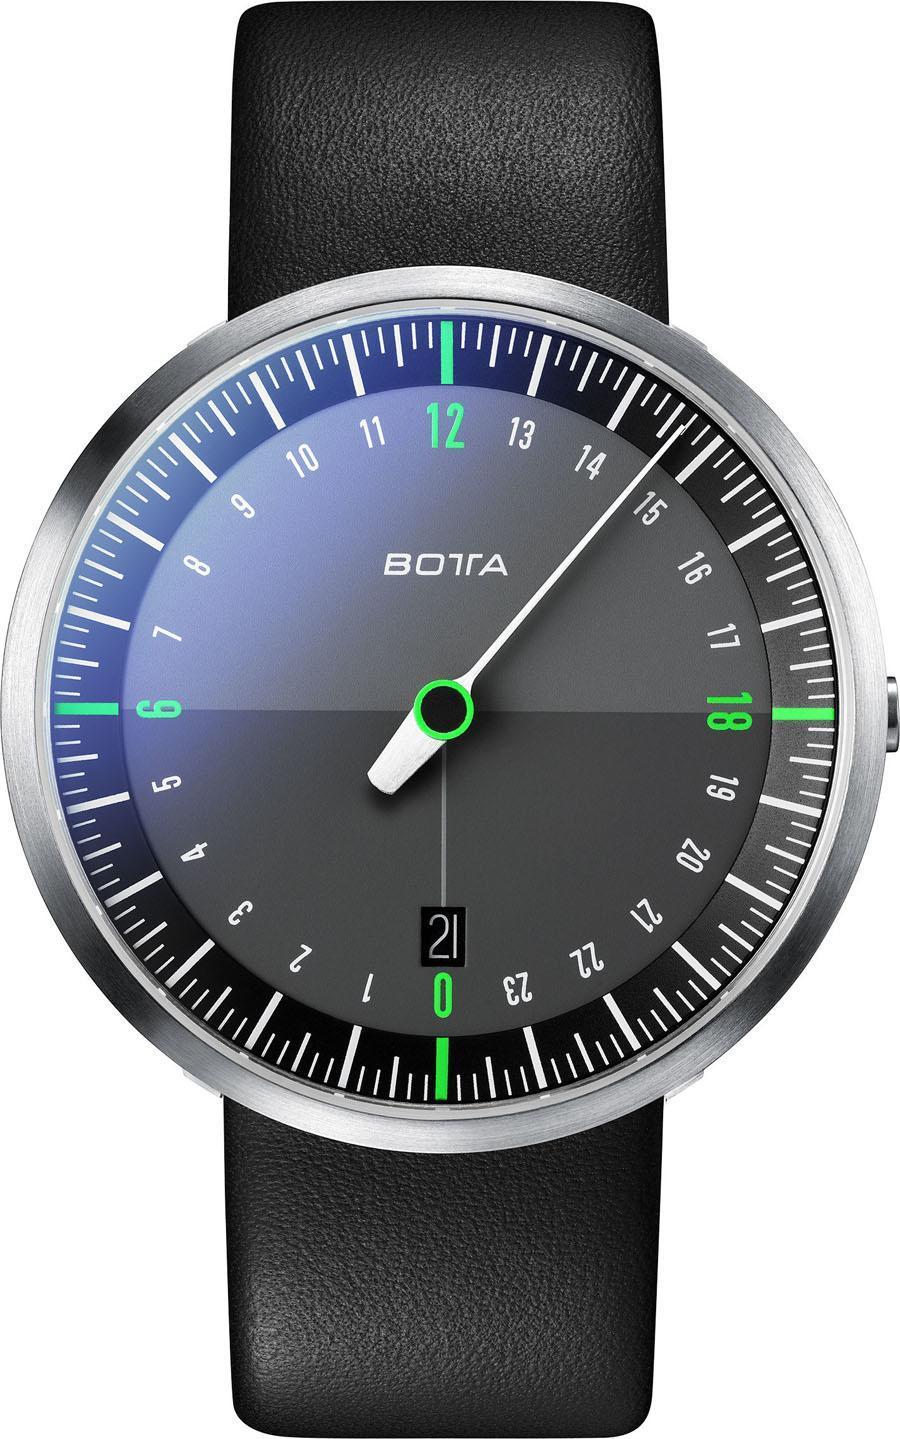 Botta-Design: Uno 24 Neo